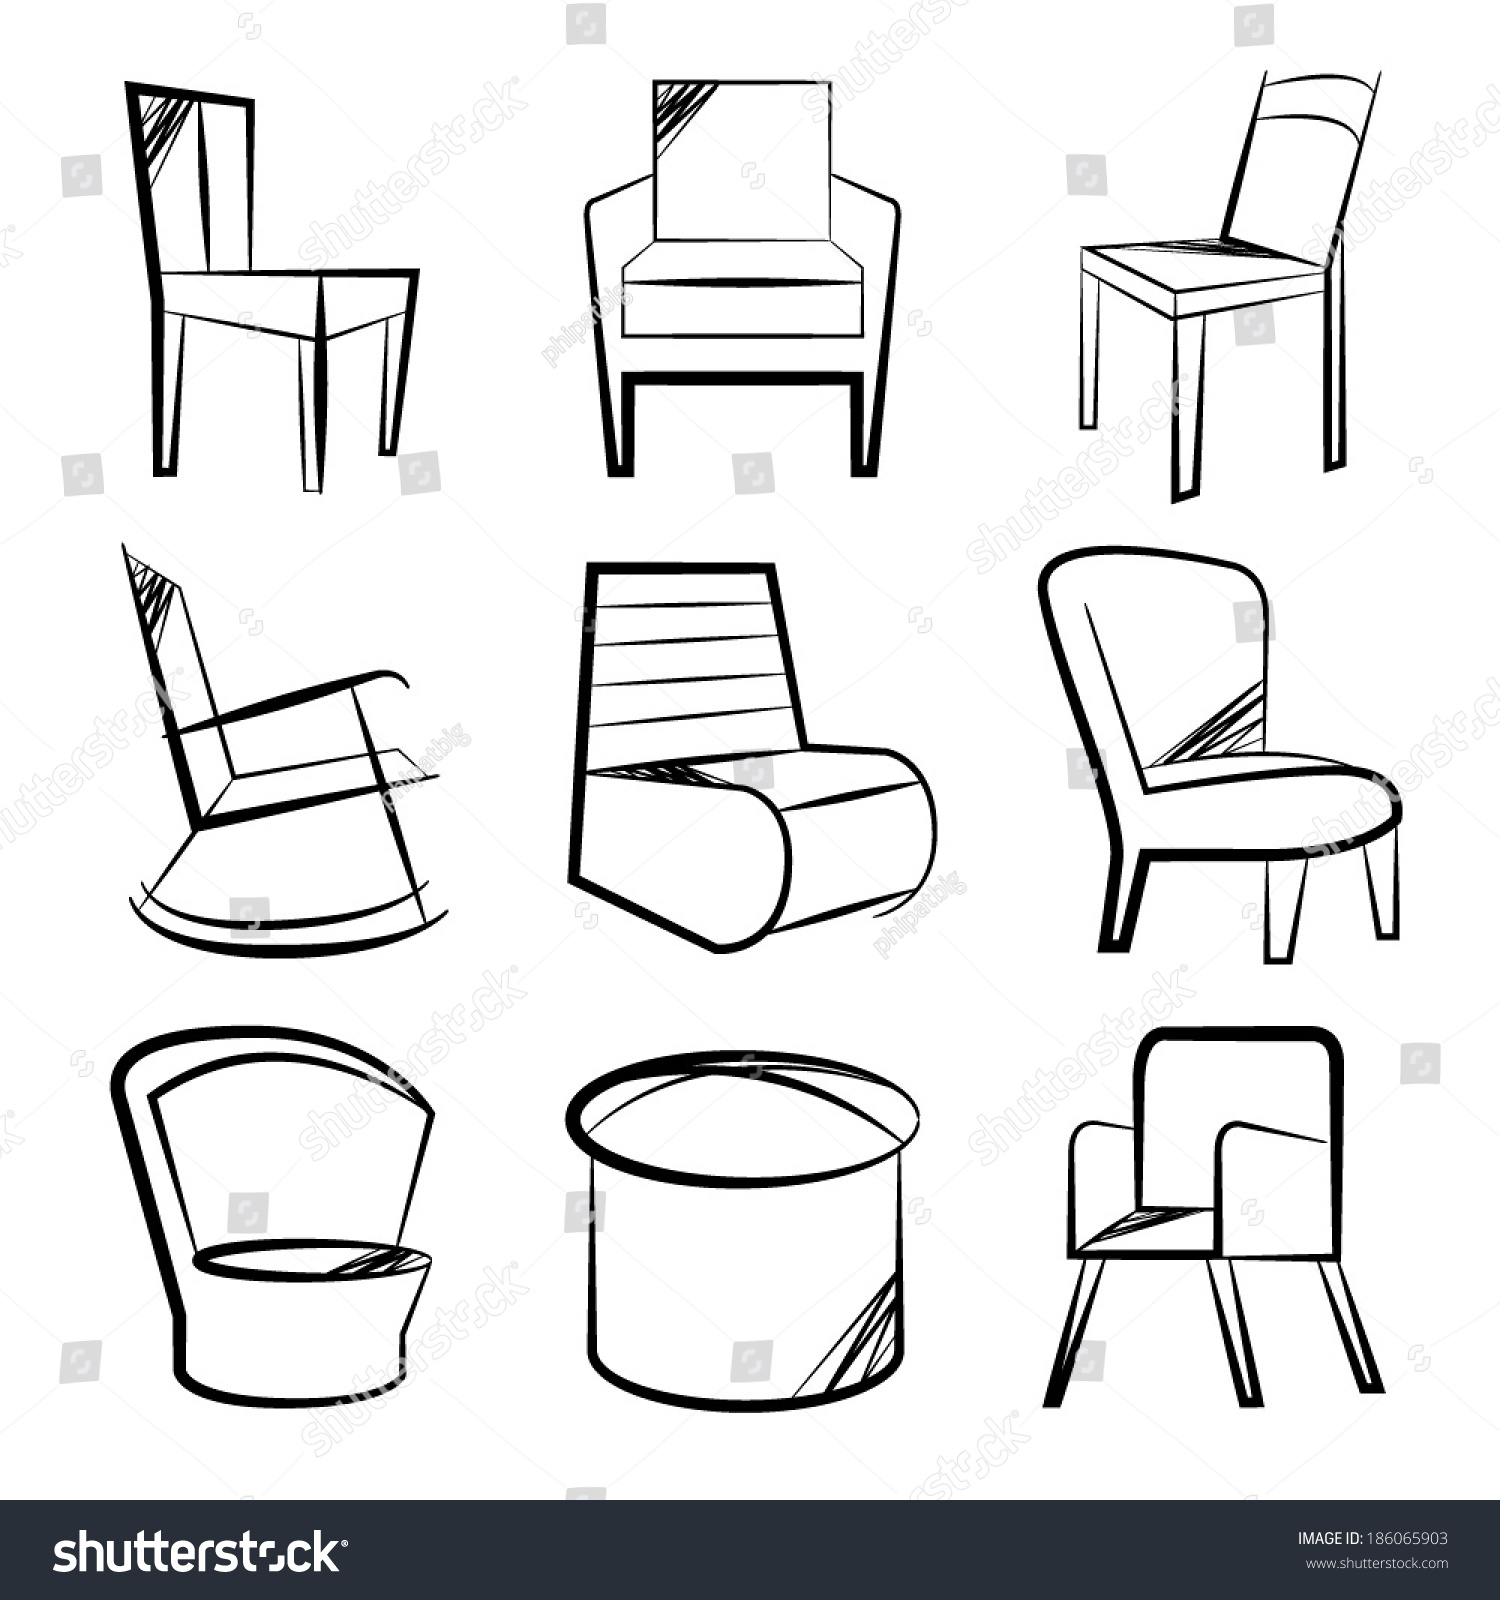 Chair Sketch jinils drawing. downloads. chairs. chair sketch. davis furniture